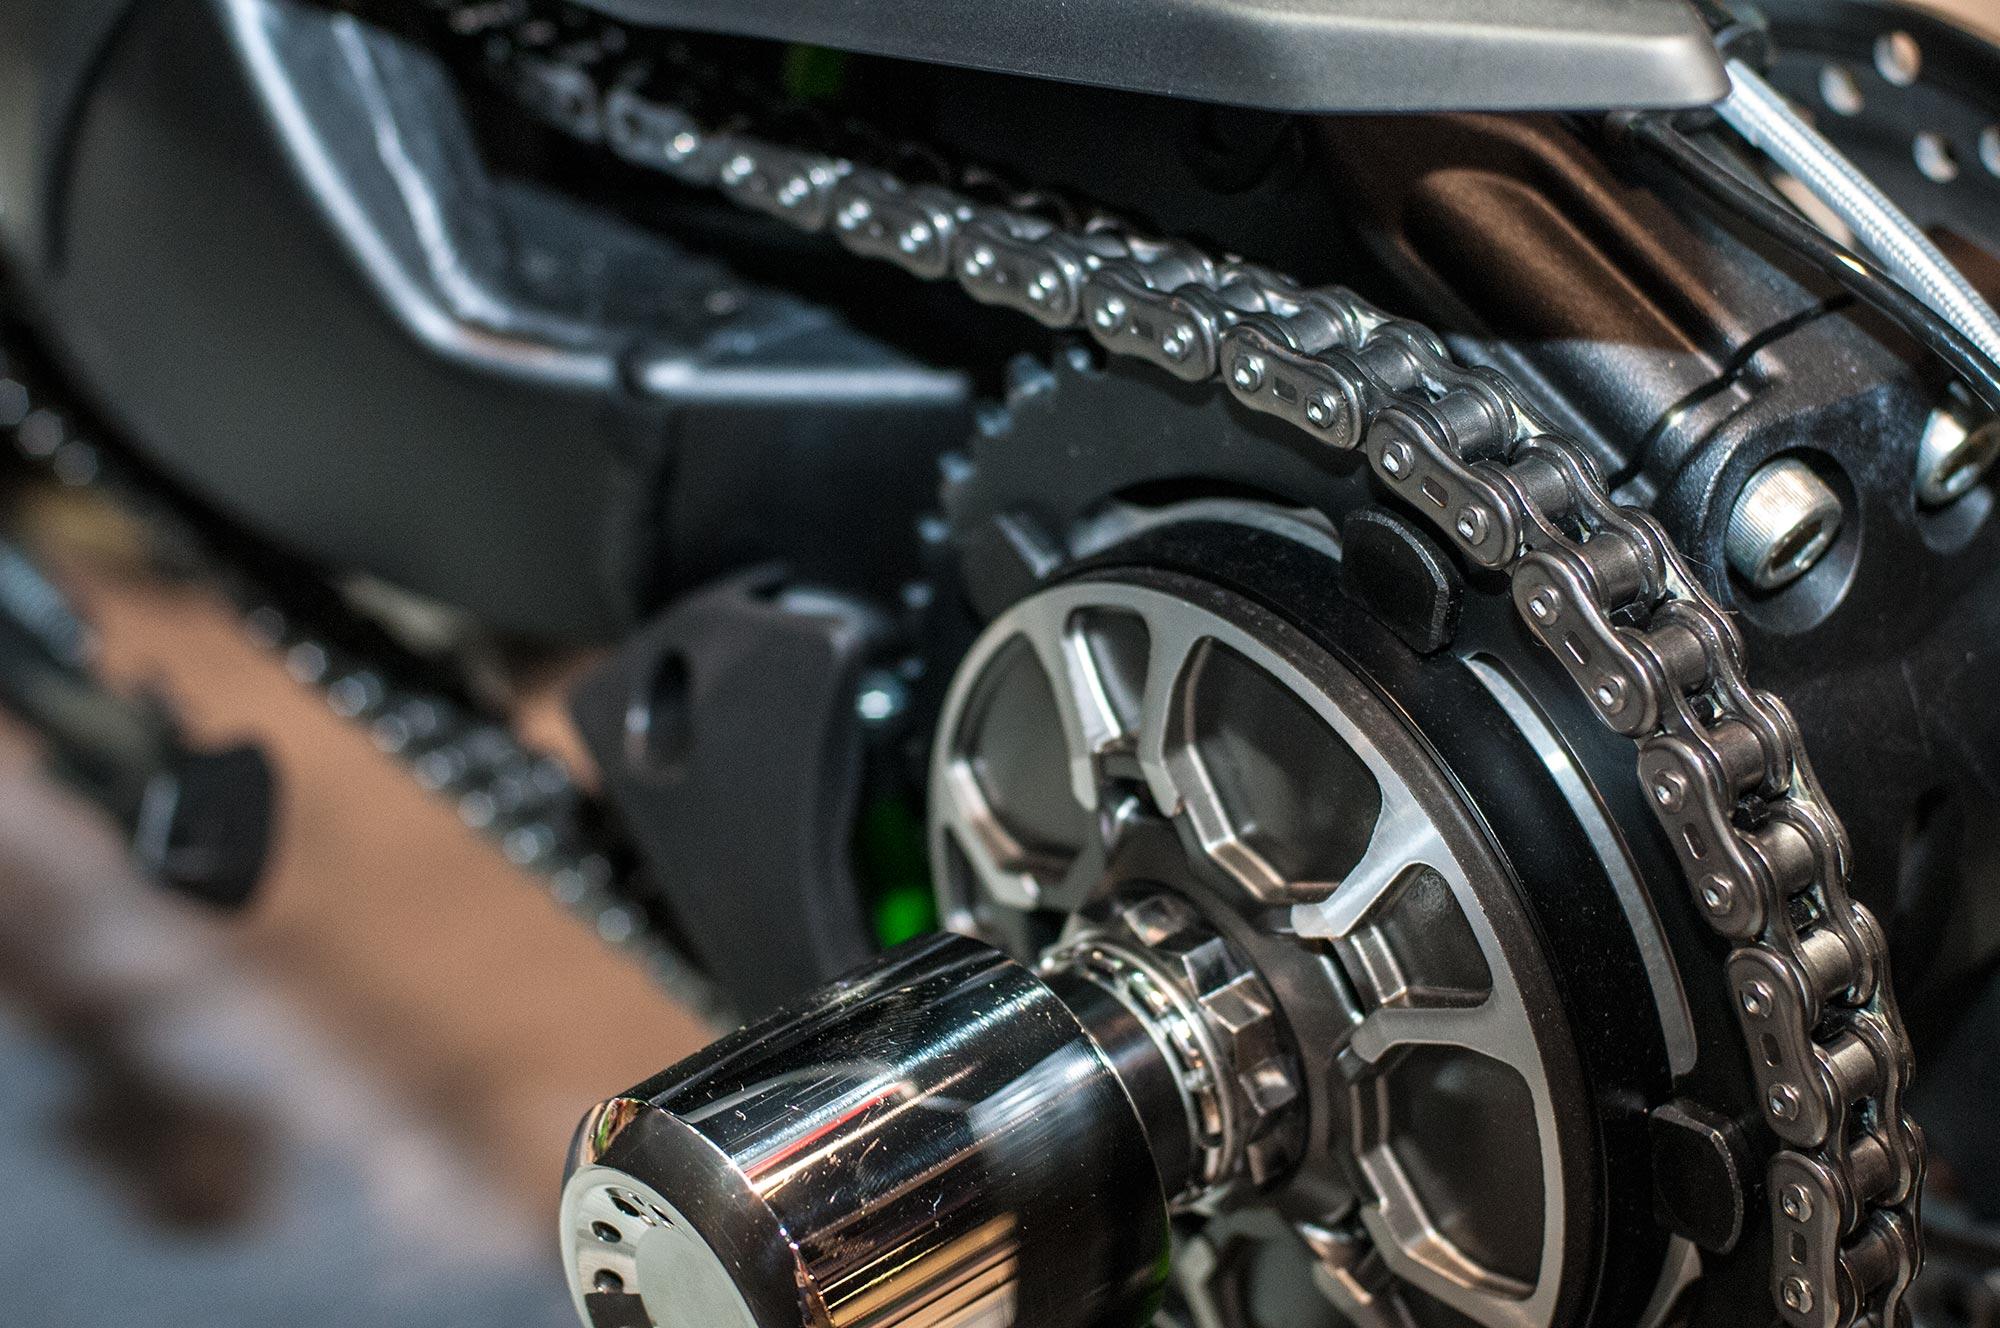 Kawasaki Ninja Incorrect Spedometer